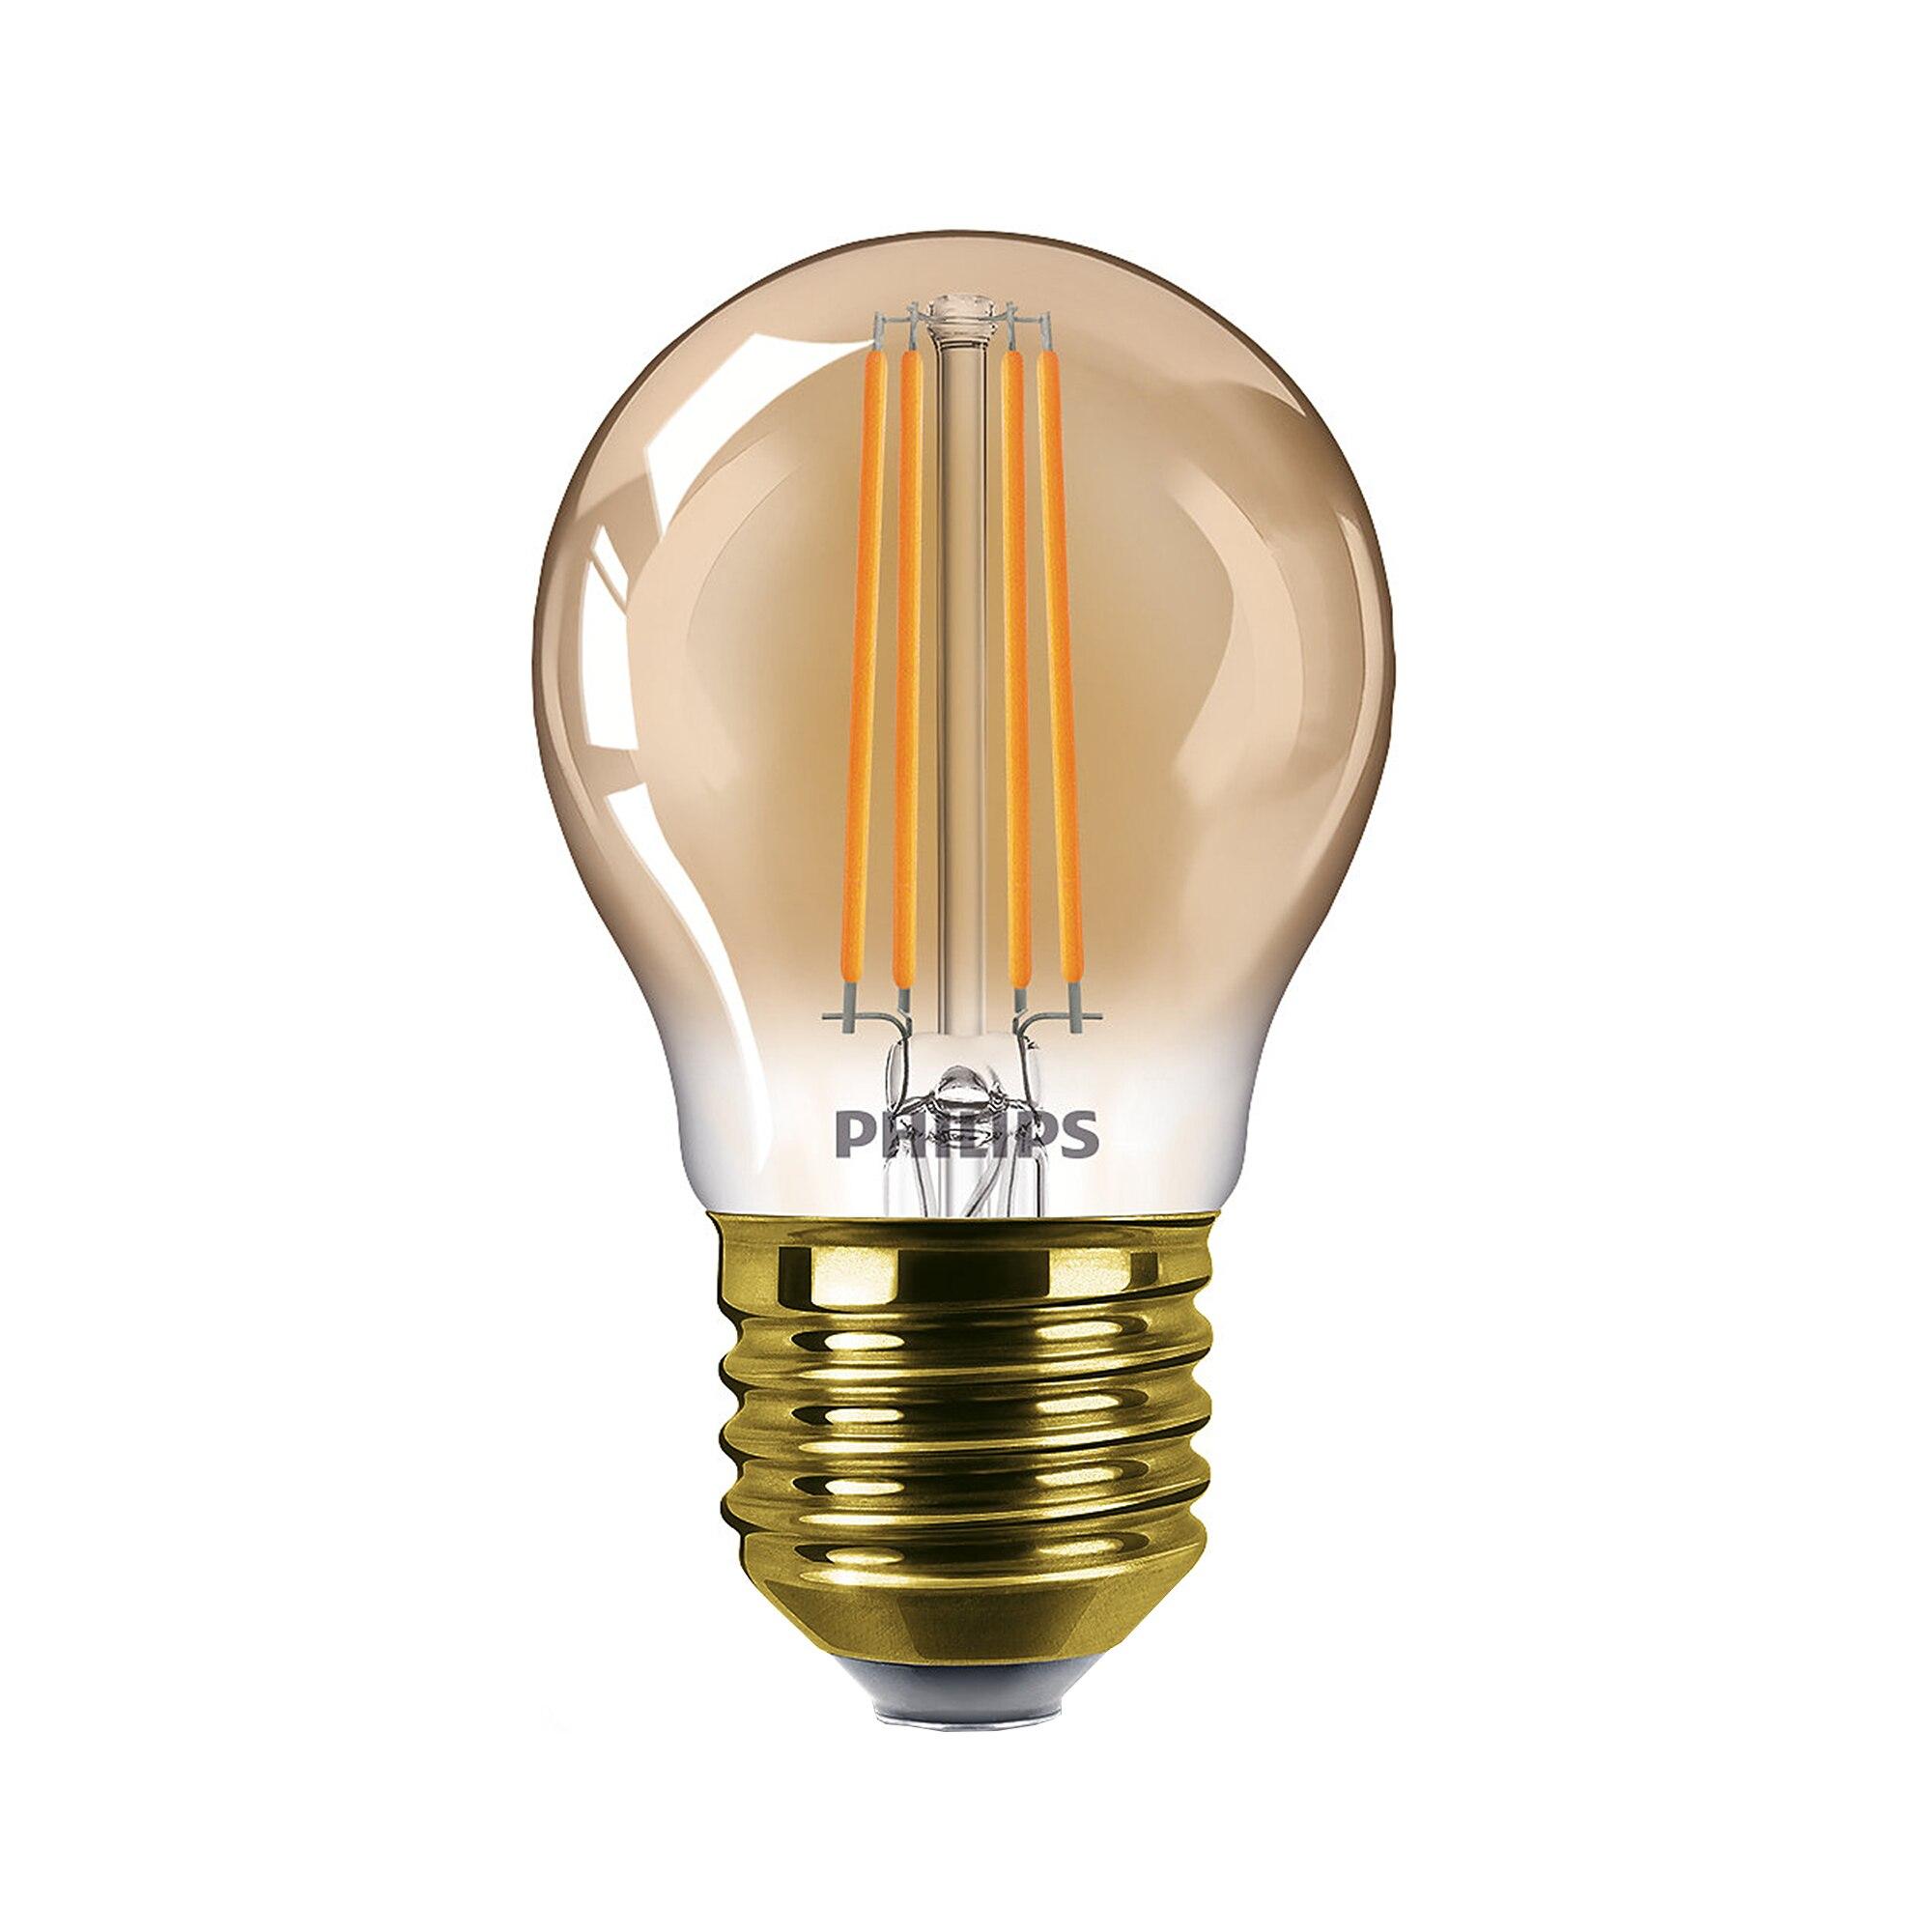 Fotografie Bec LED vintage dimabil Philips Classic, E27, 5W (32W), 150 lm, 2200K, flacara, Gold